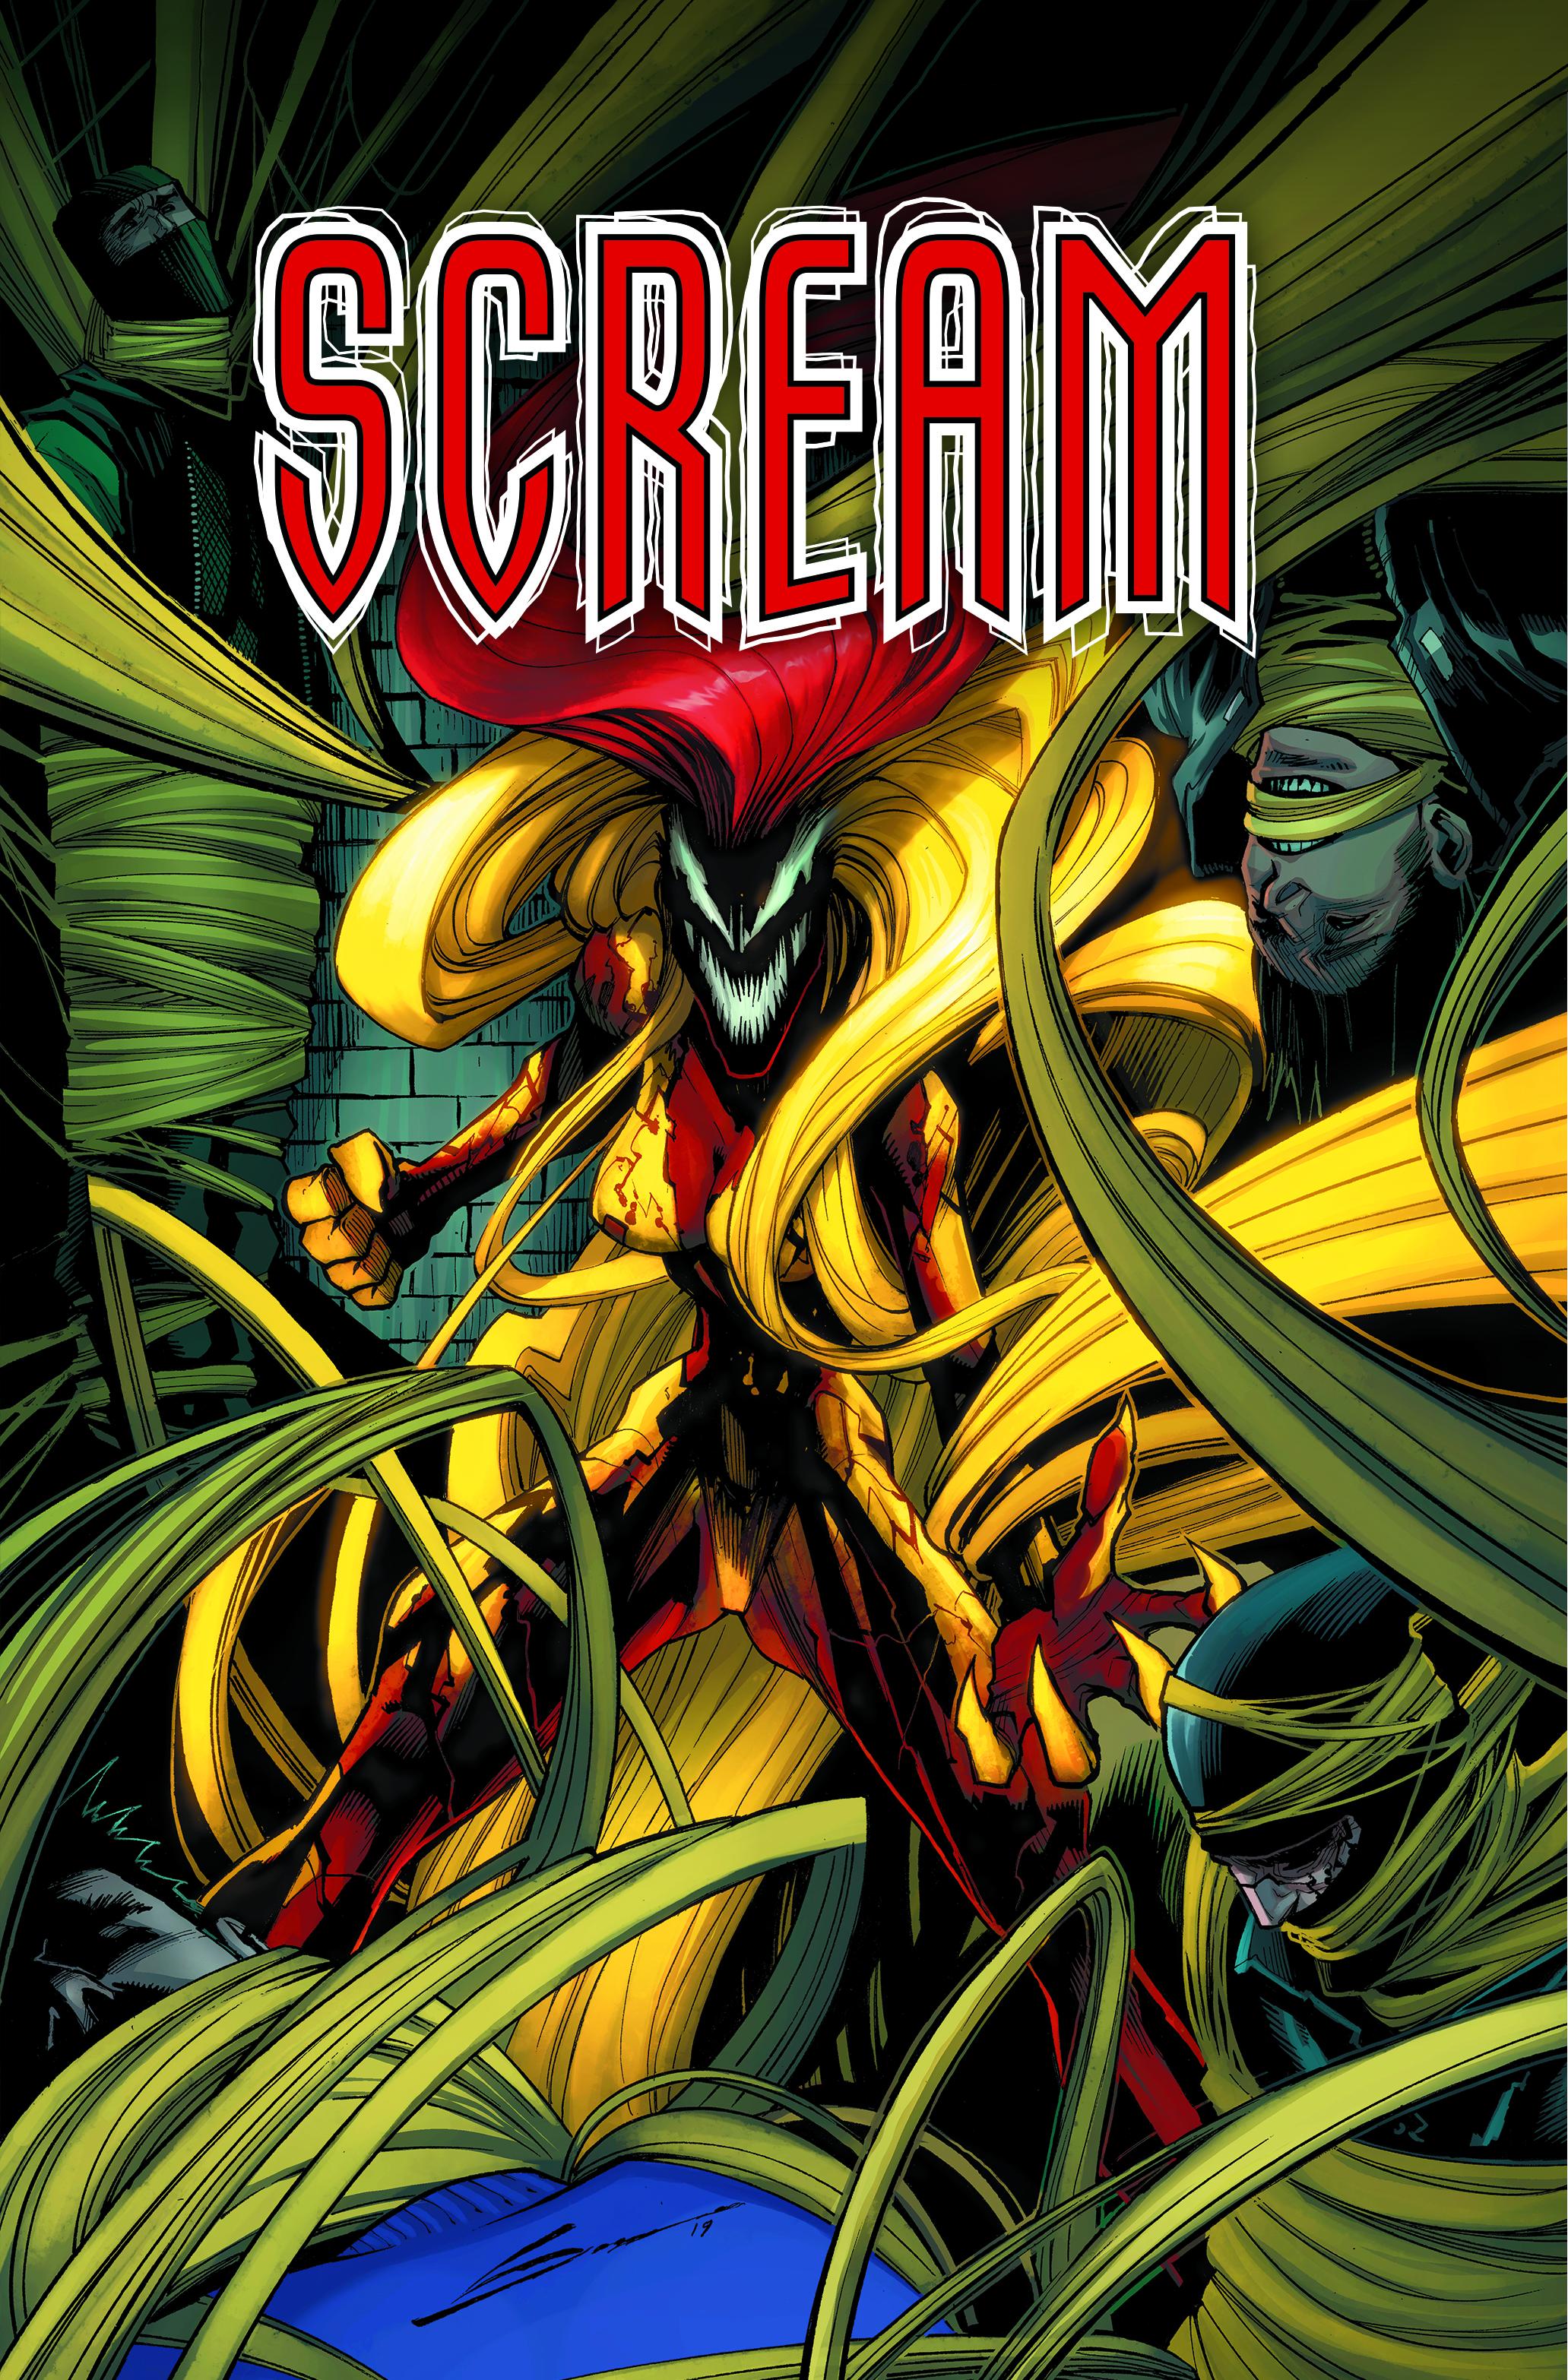 Logo design for  Scream . Content copyright Marvel Entertainment, 2019.